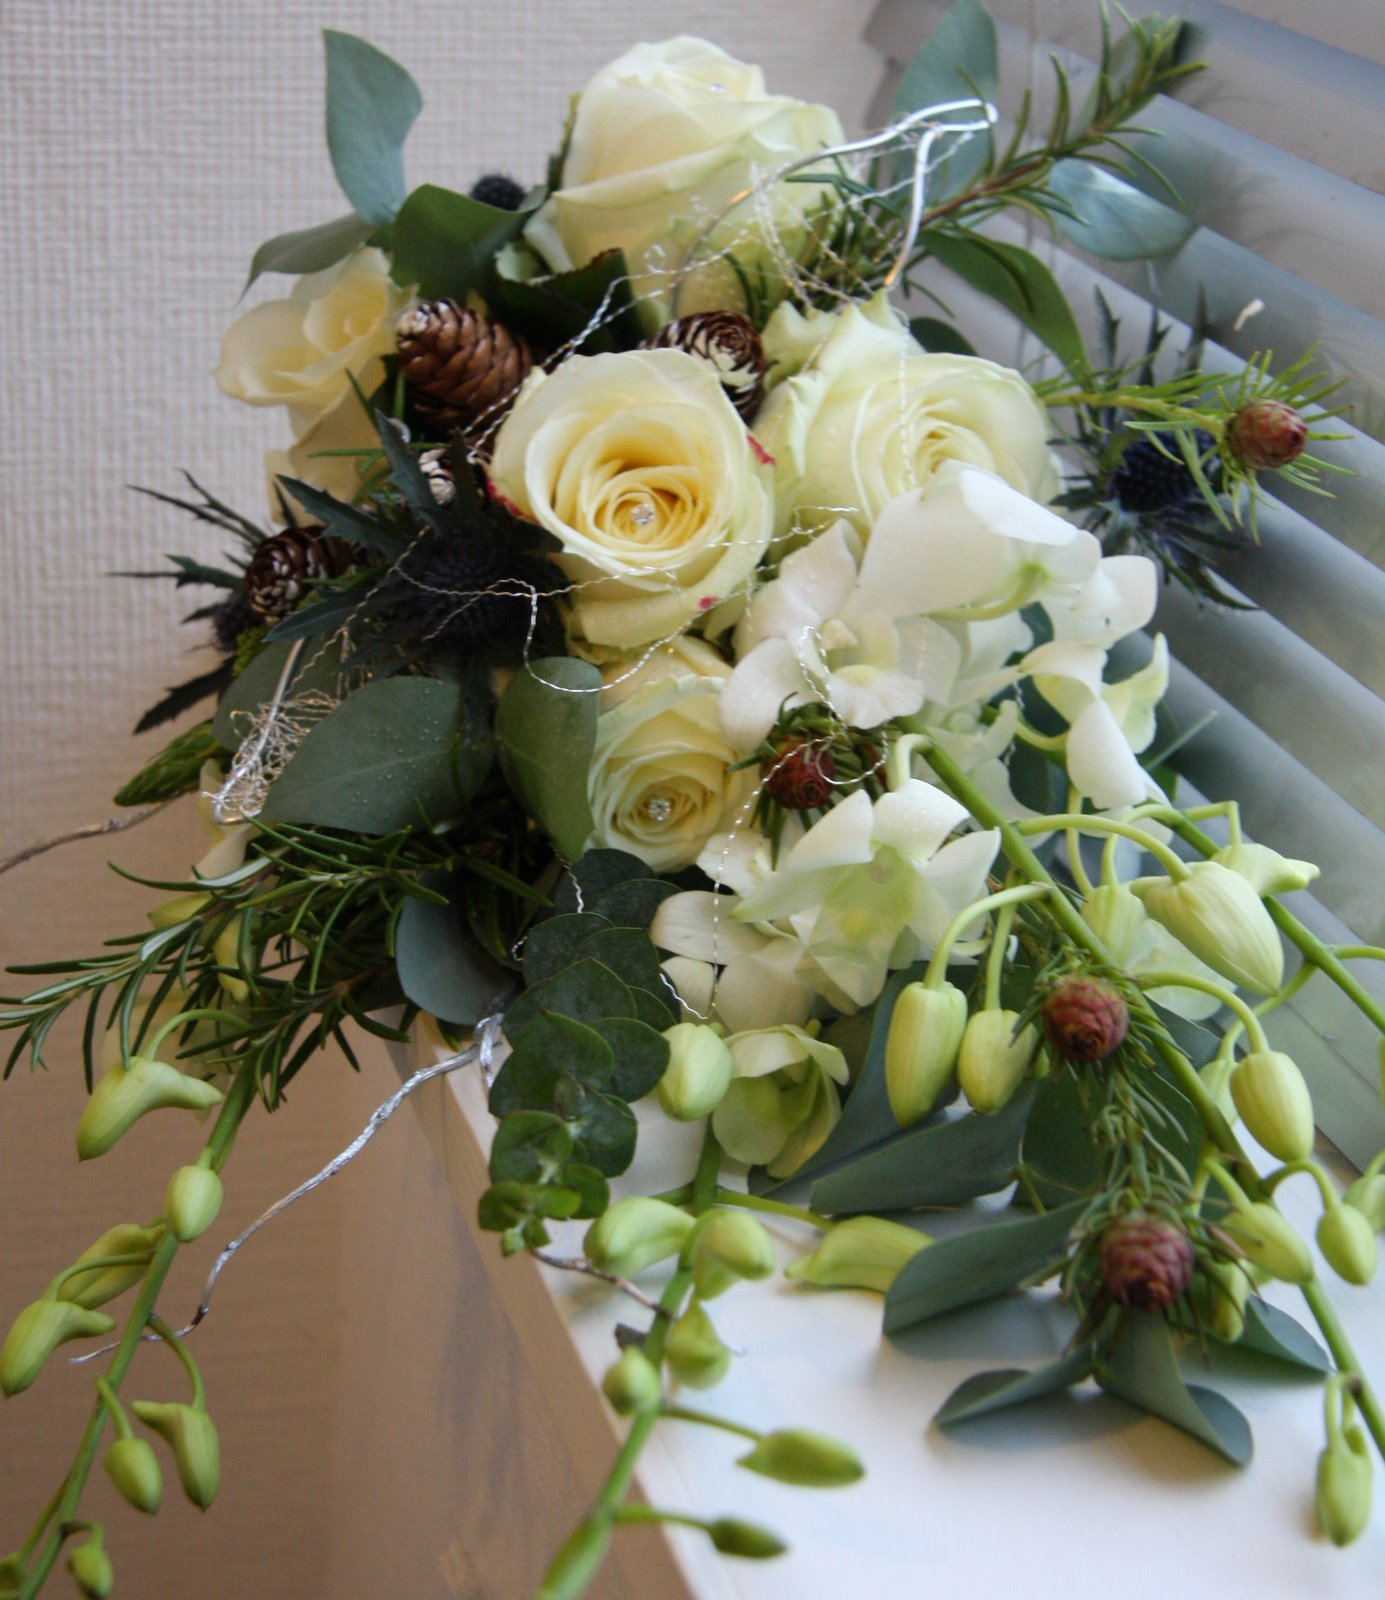 Christmas Wedding Flowers: The Flower Magician: Frosty Christmas Wedding Bouquet